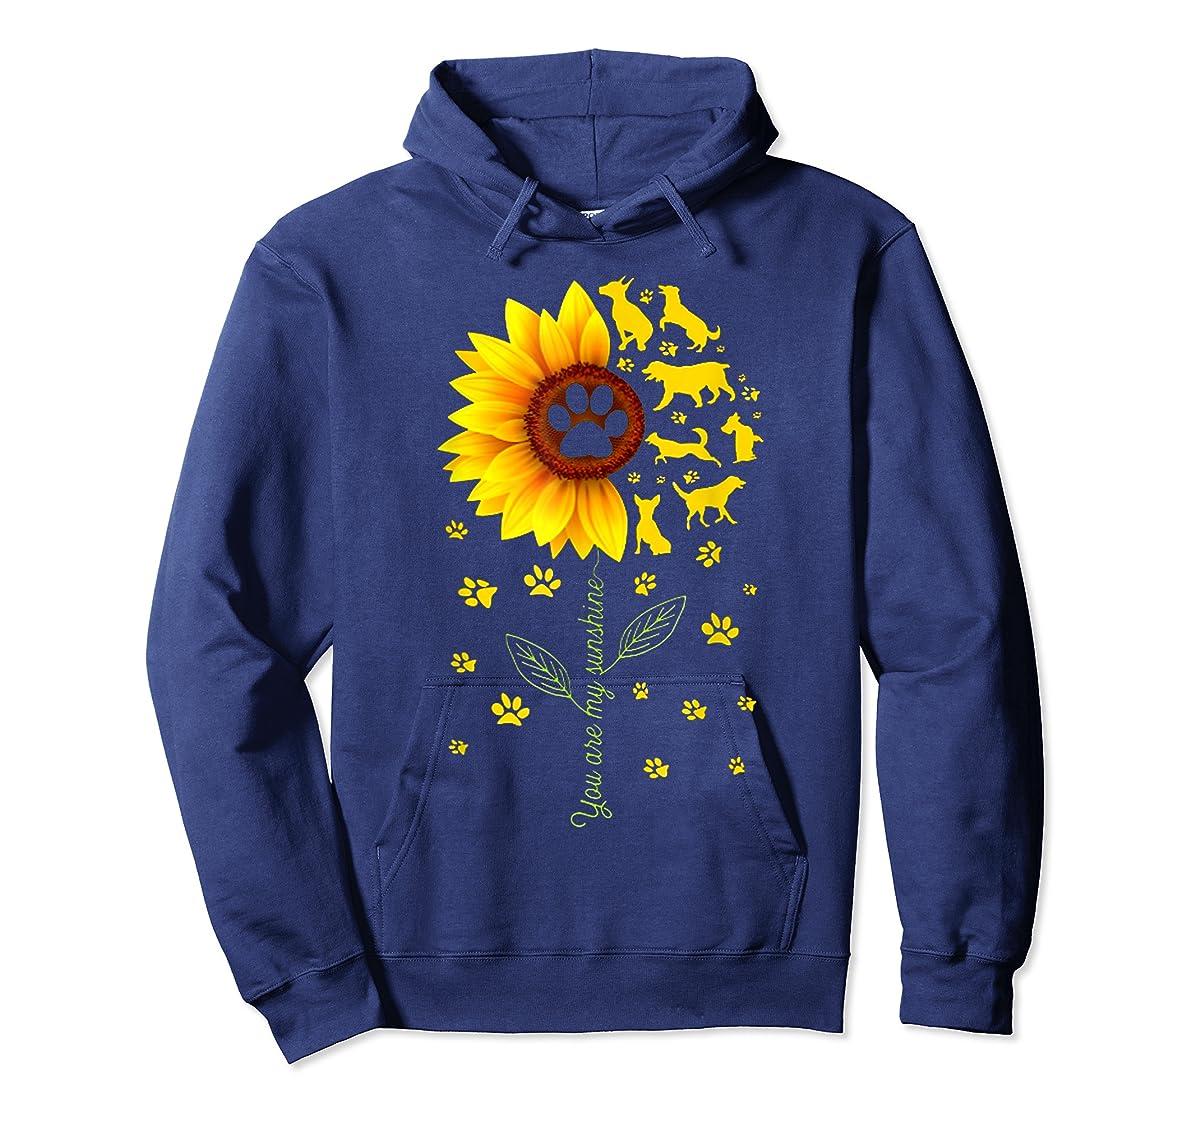 You are my Sunshine t-shirt-Hoodie-Navy